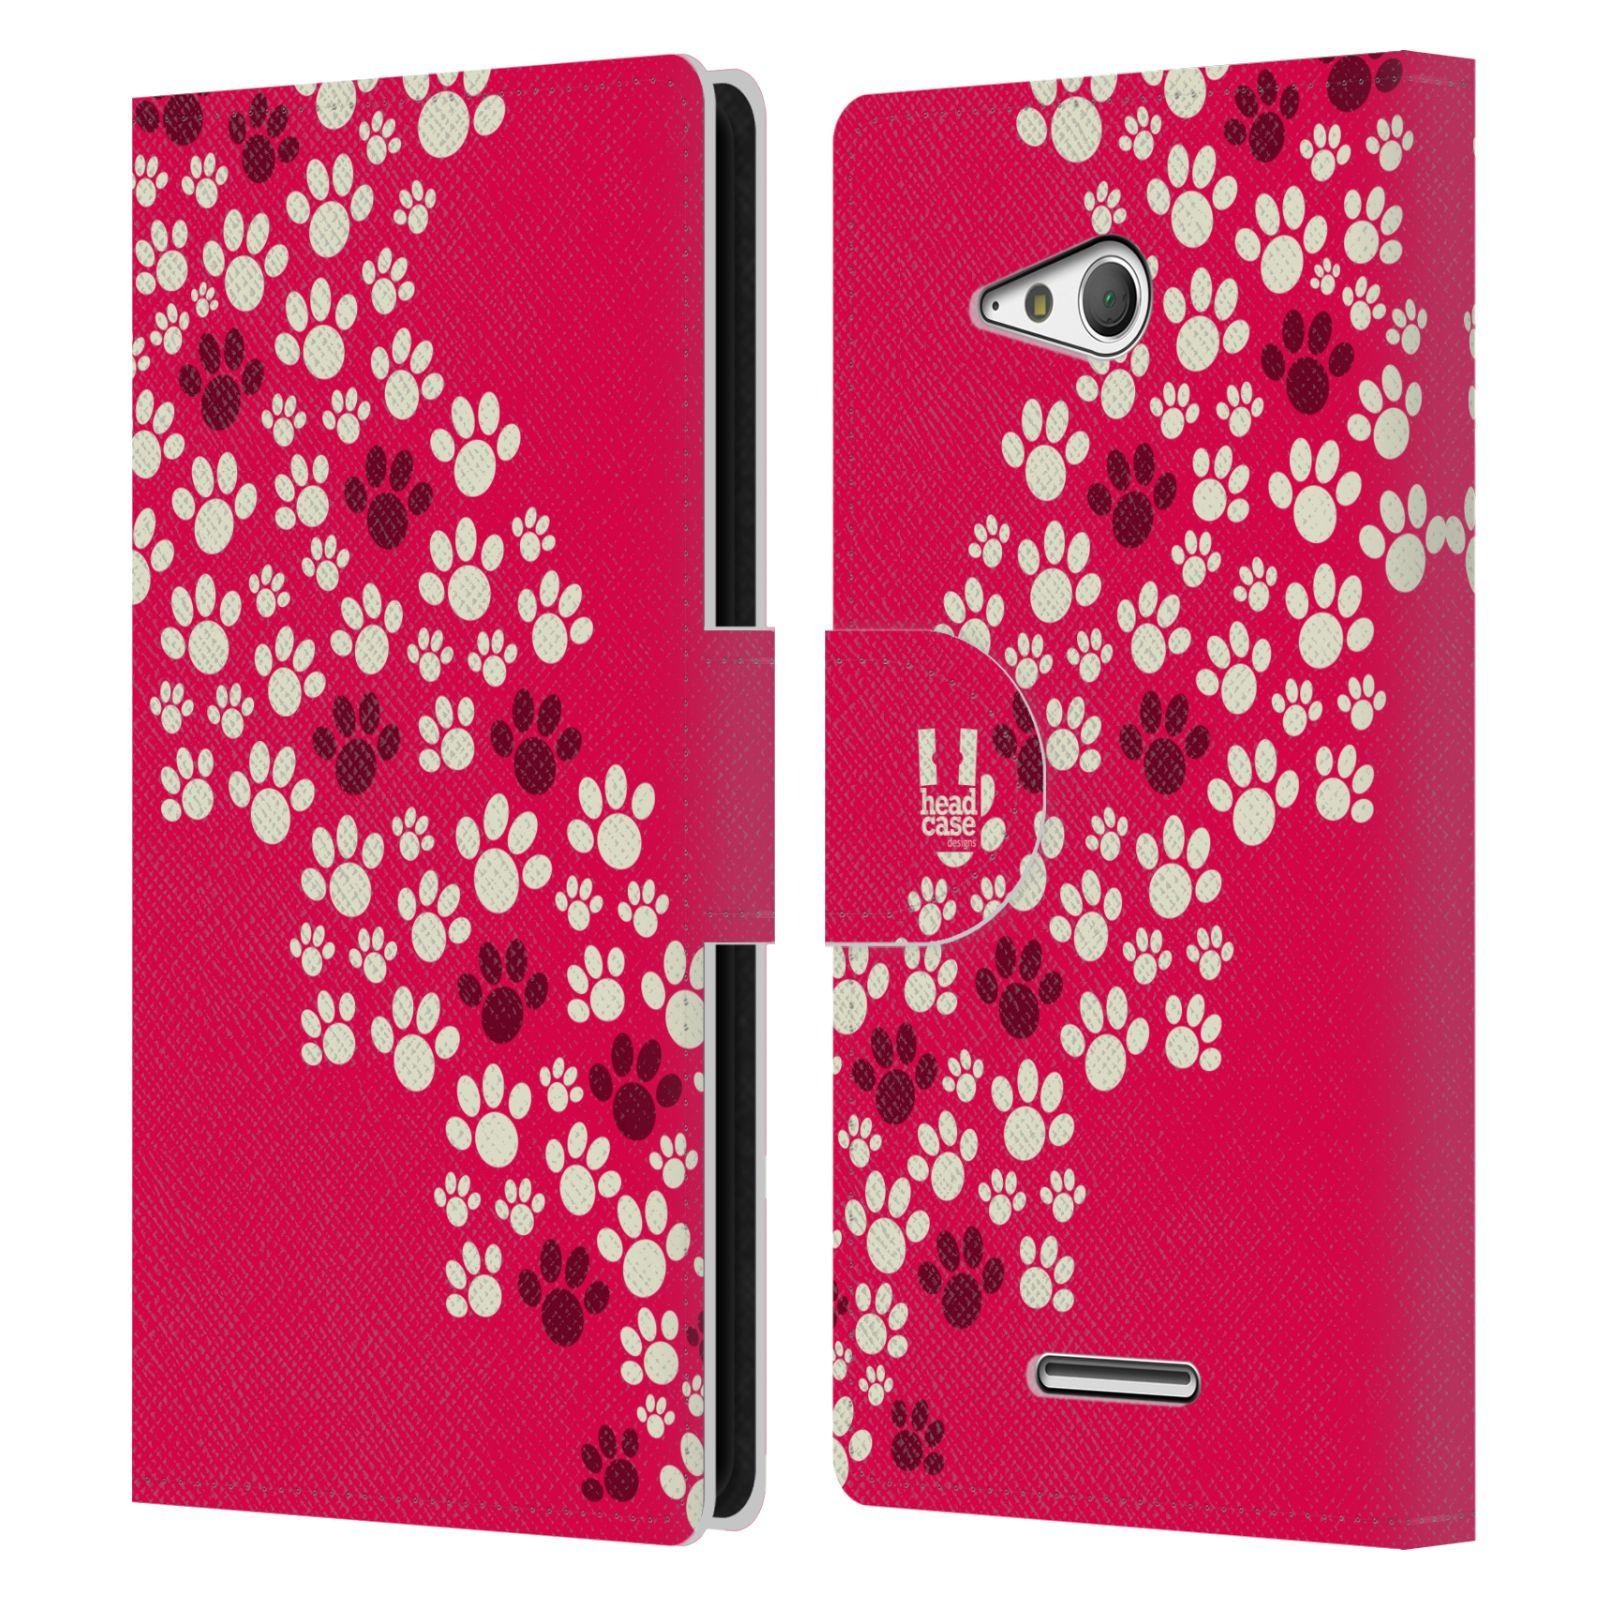 HEAD CASE Flipové pouzdro pro mobil SONY XPERIA E4g Pejsek ťapky růžová barva